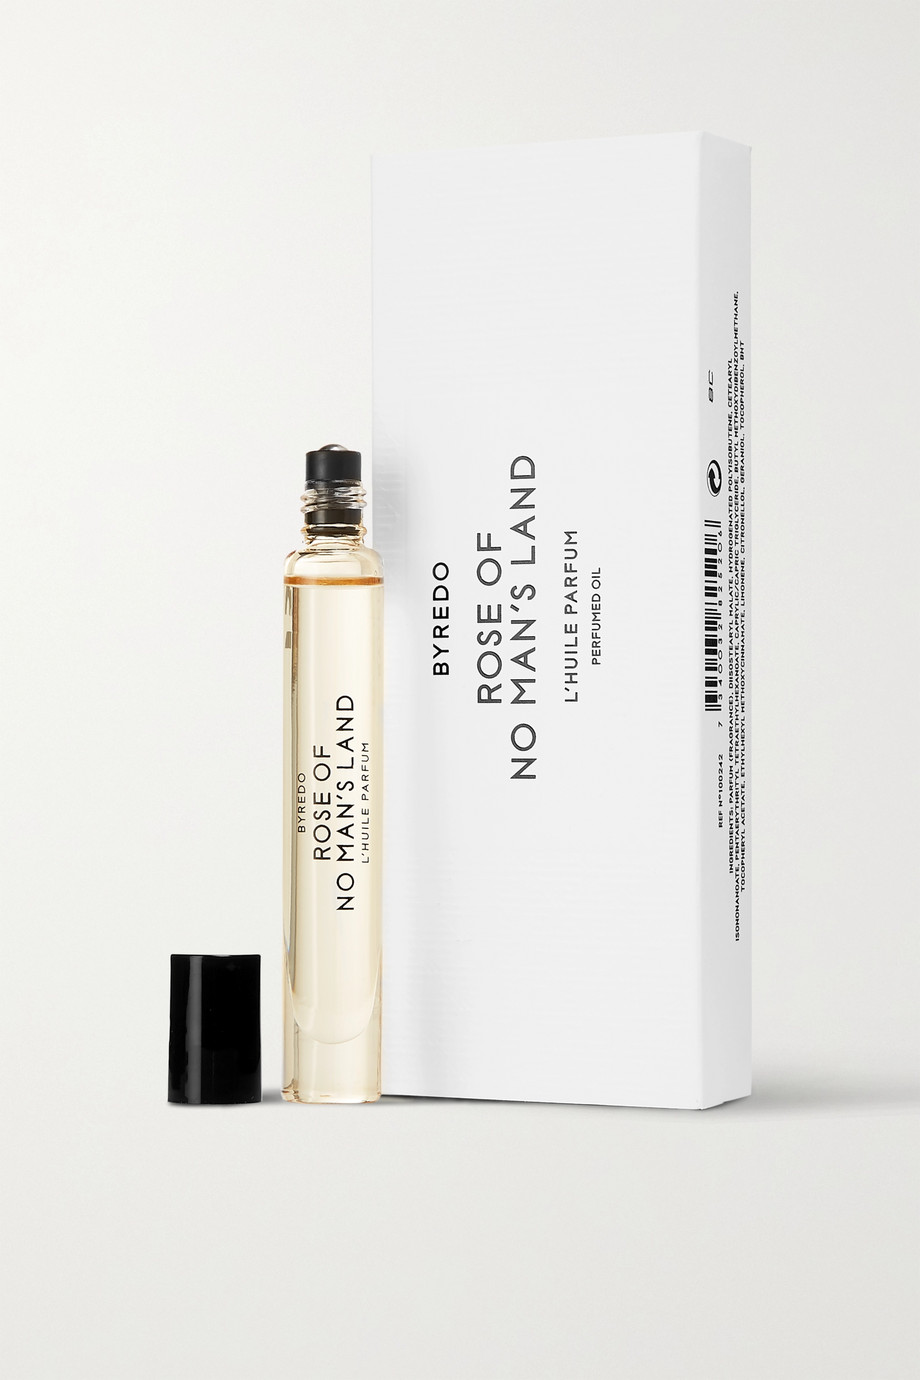 Byredo Perfumed Oil Roll-On - Rose of No Man's Land, 7.5ml